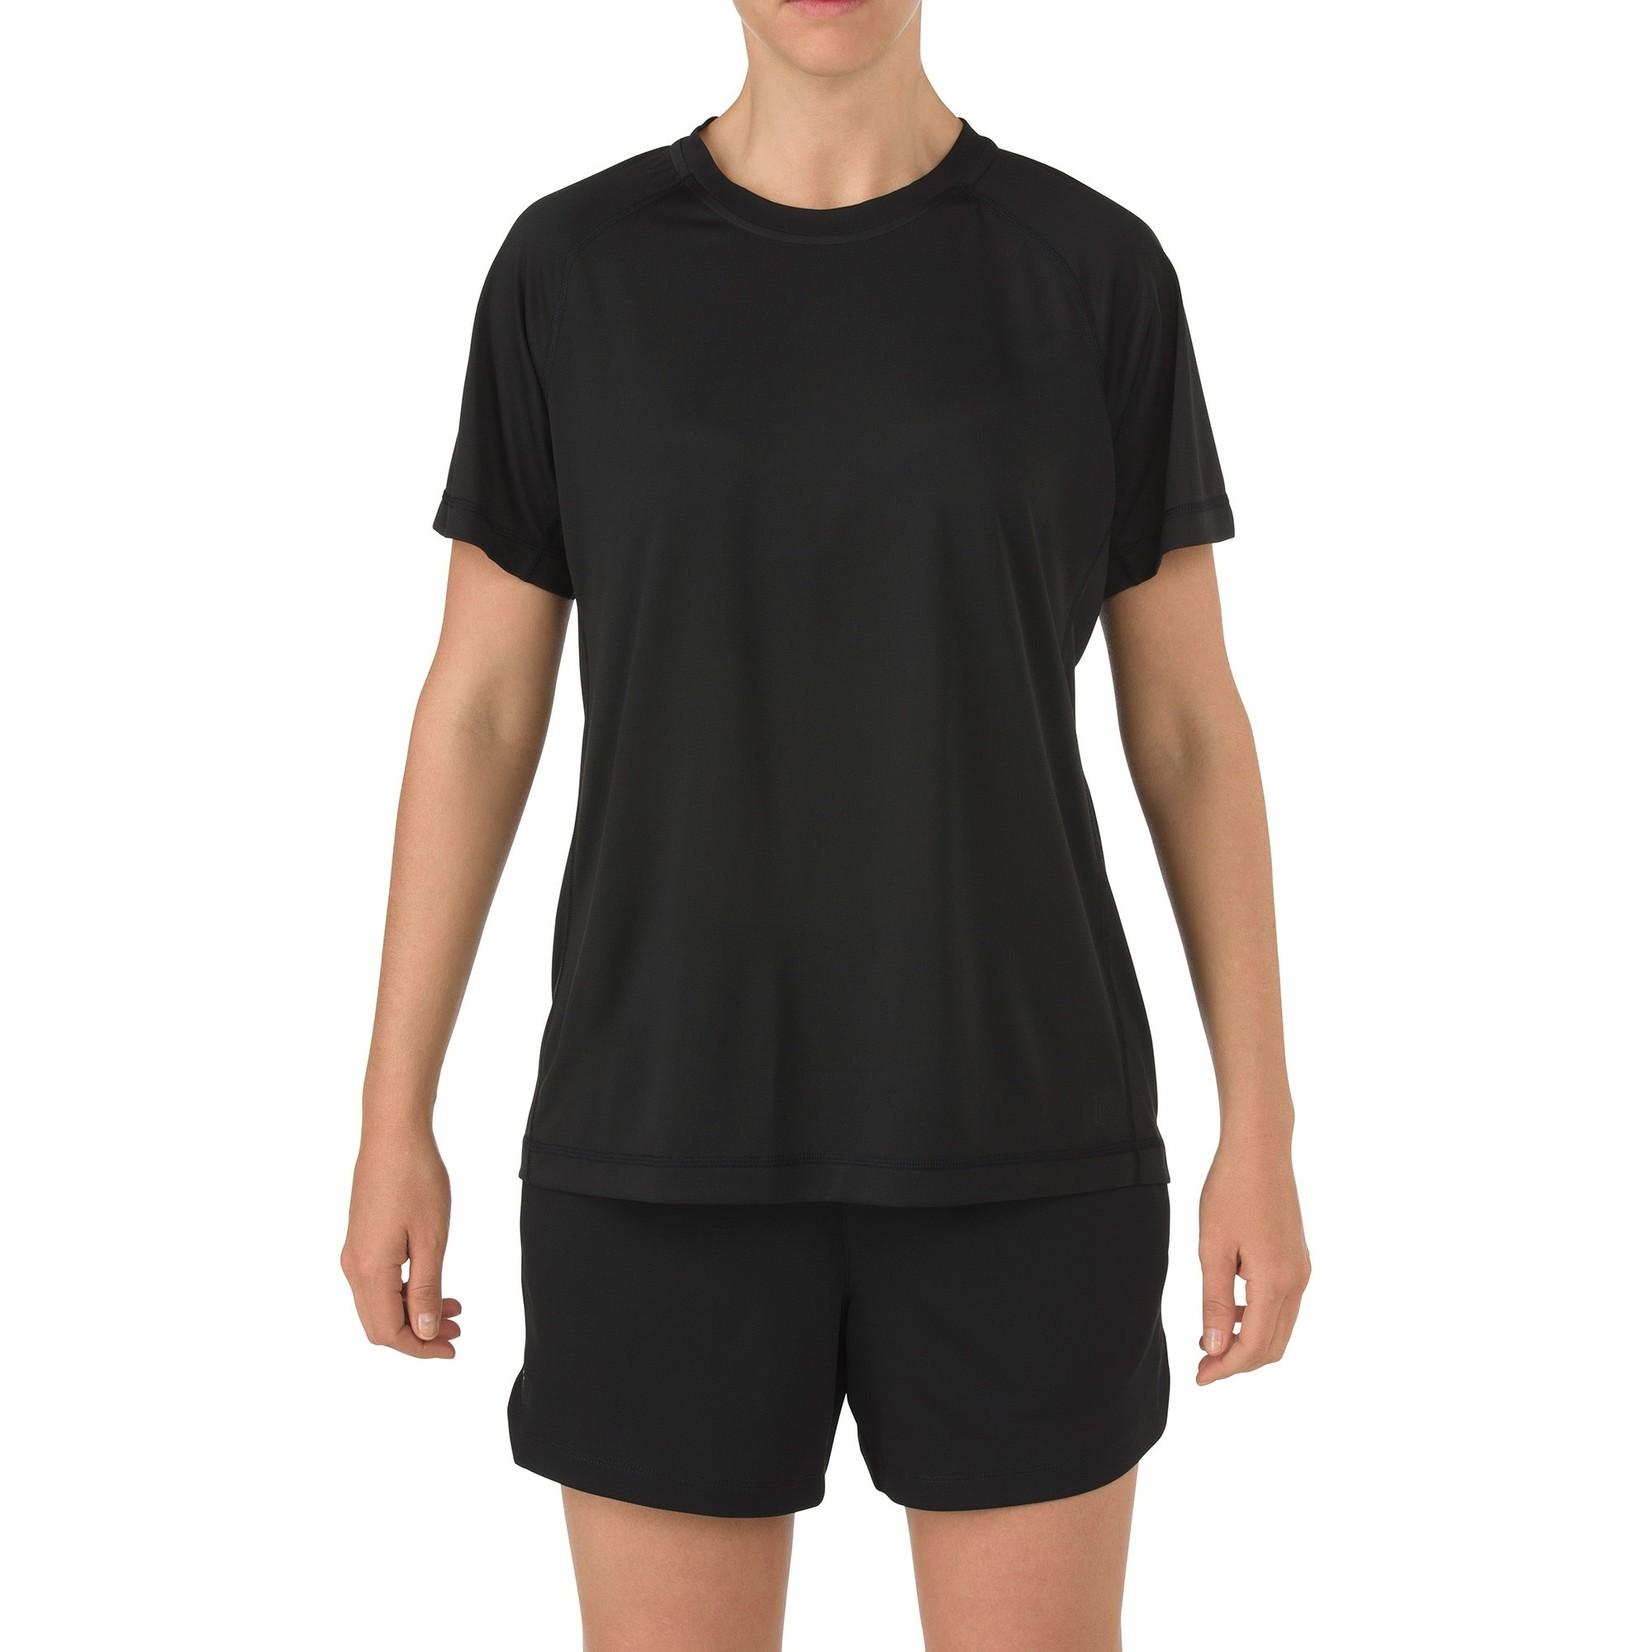 5.11 Tactical 5.11 Women's Utility PT Shirt -Small